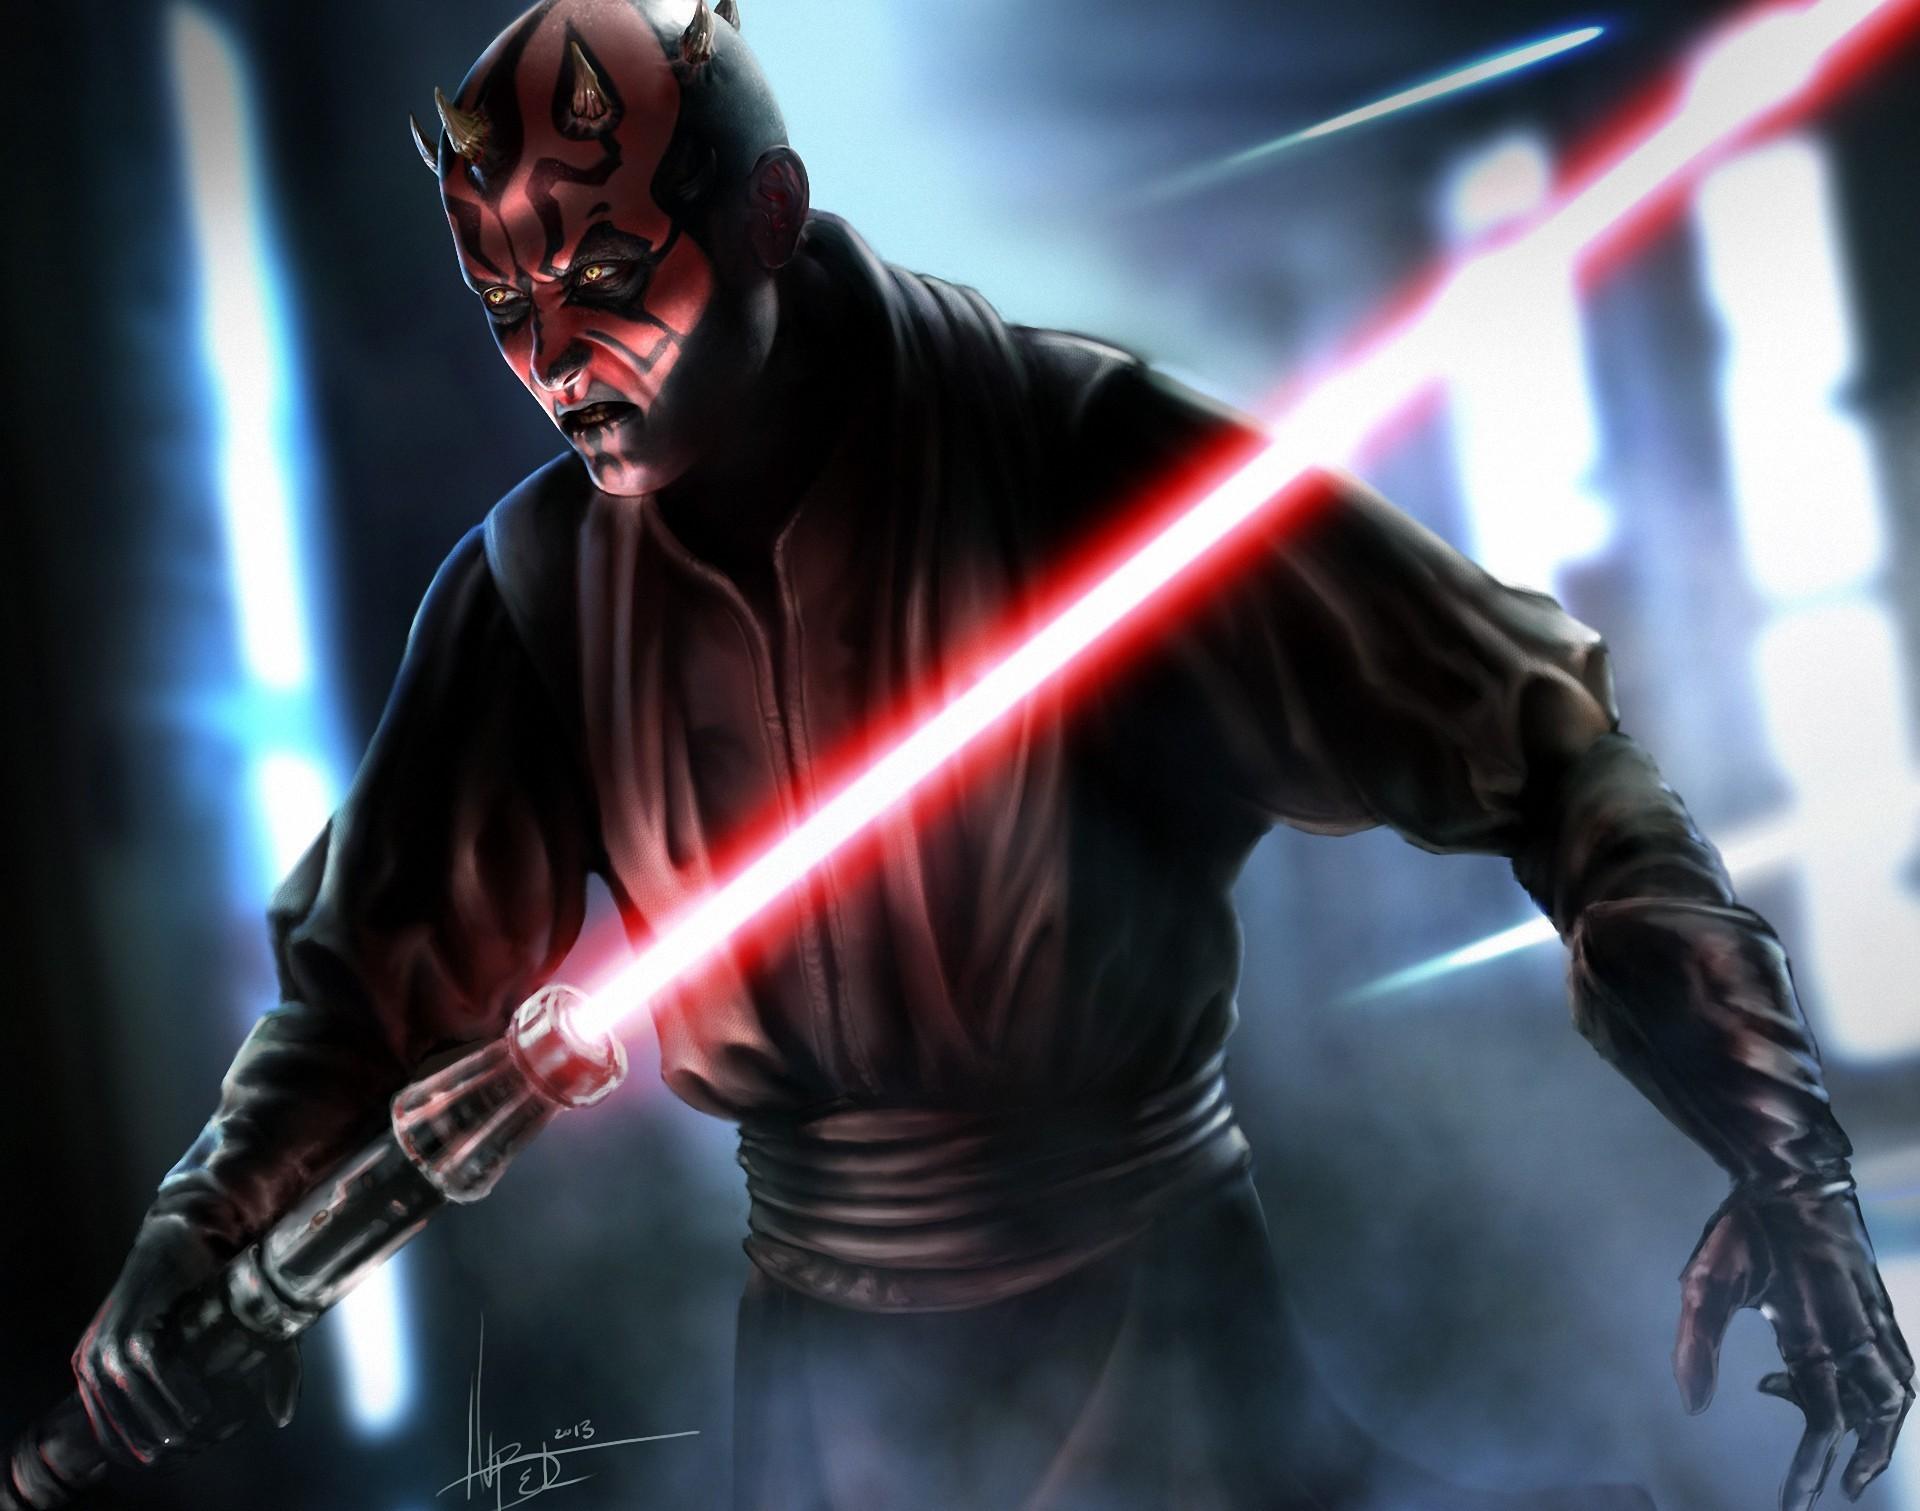 Wallpaper - Darth Maul Star Wars Sith , HD Wallpaper & Backgrounds